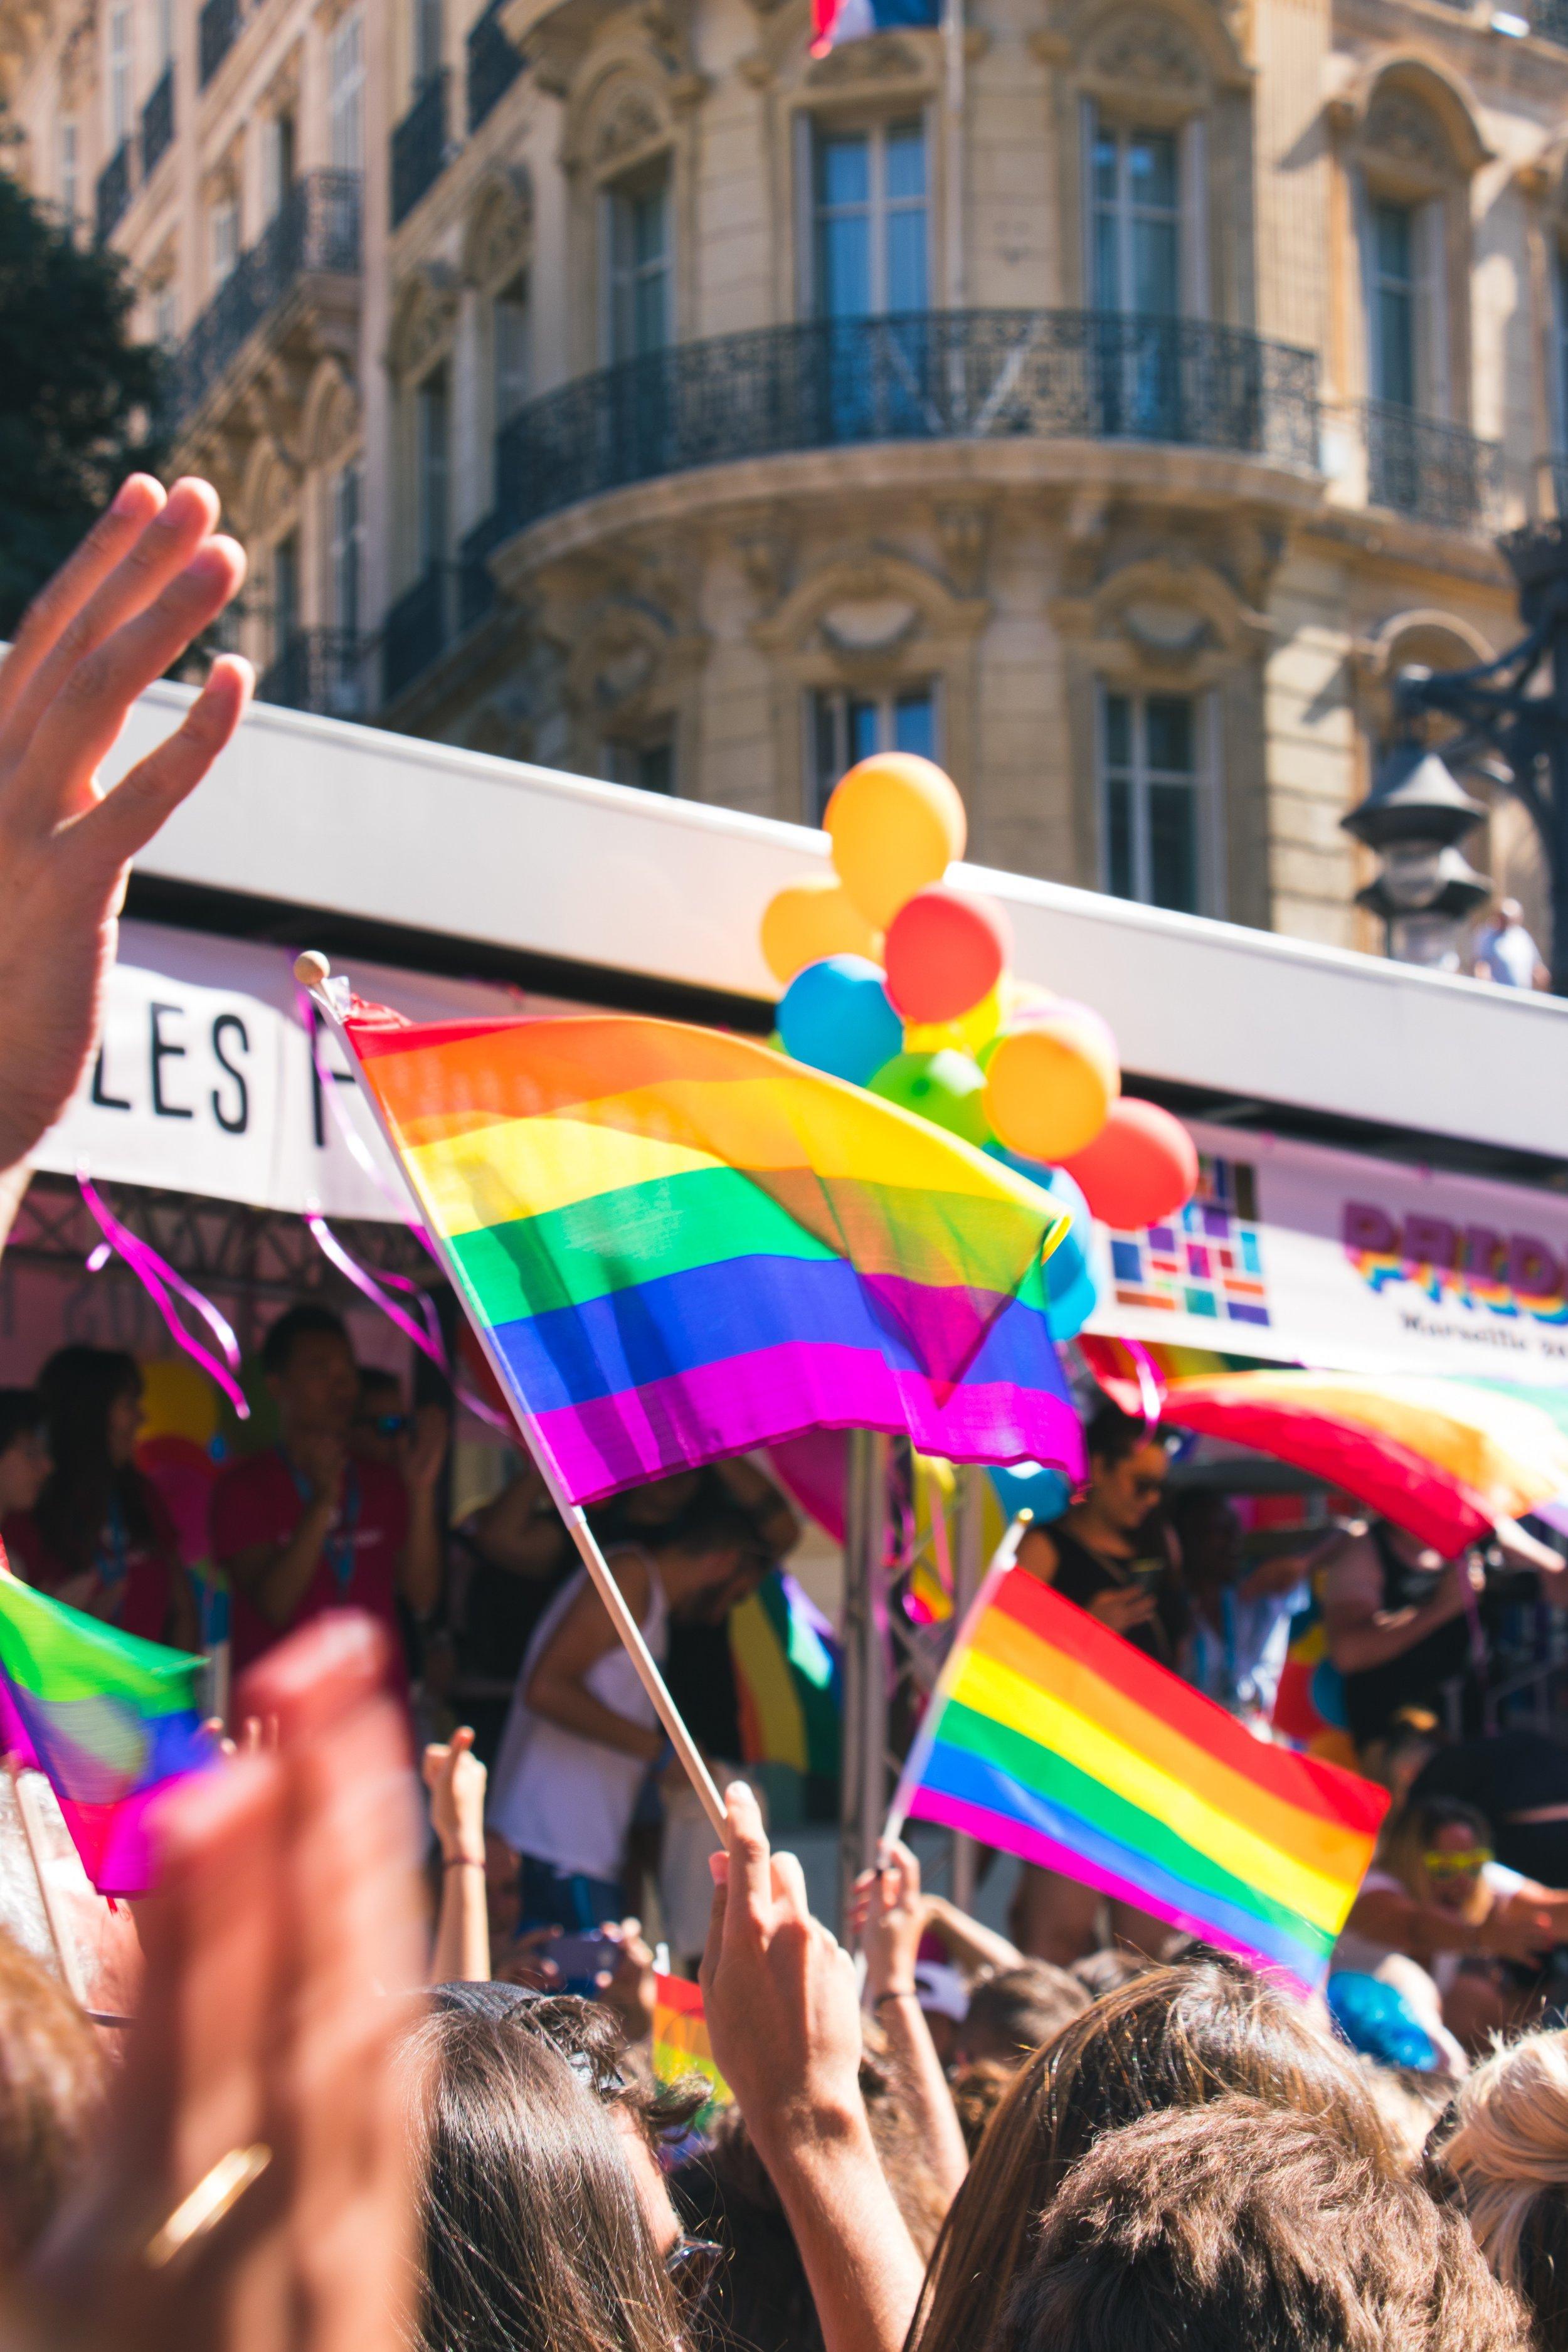 How Christians Should Navigate Pride Month